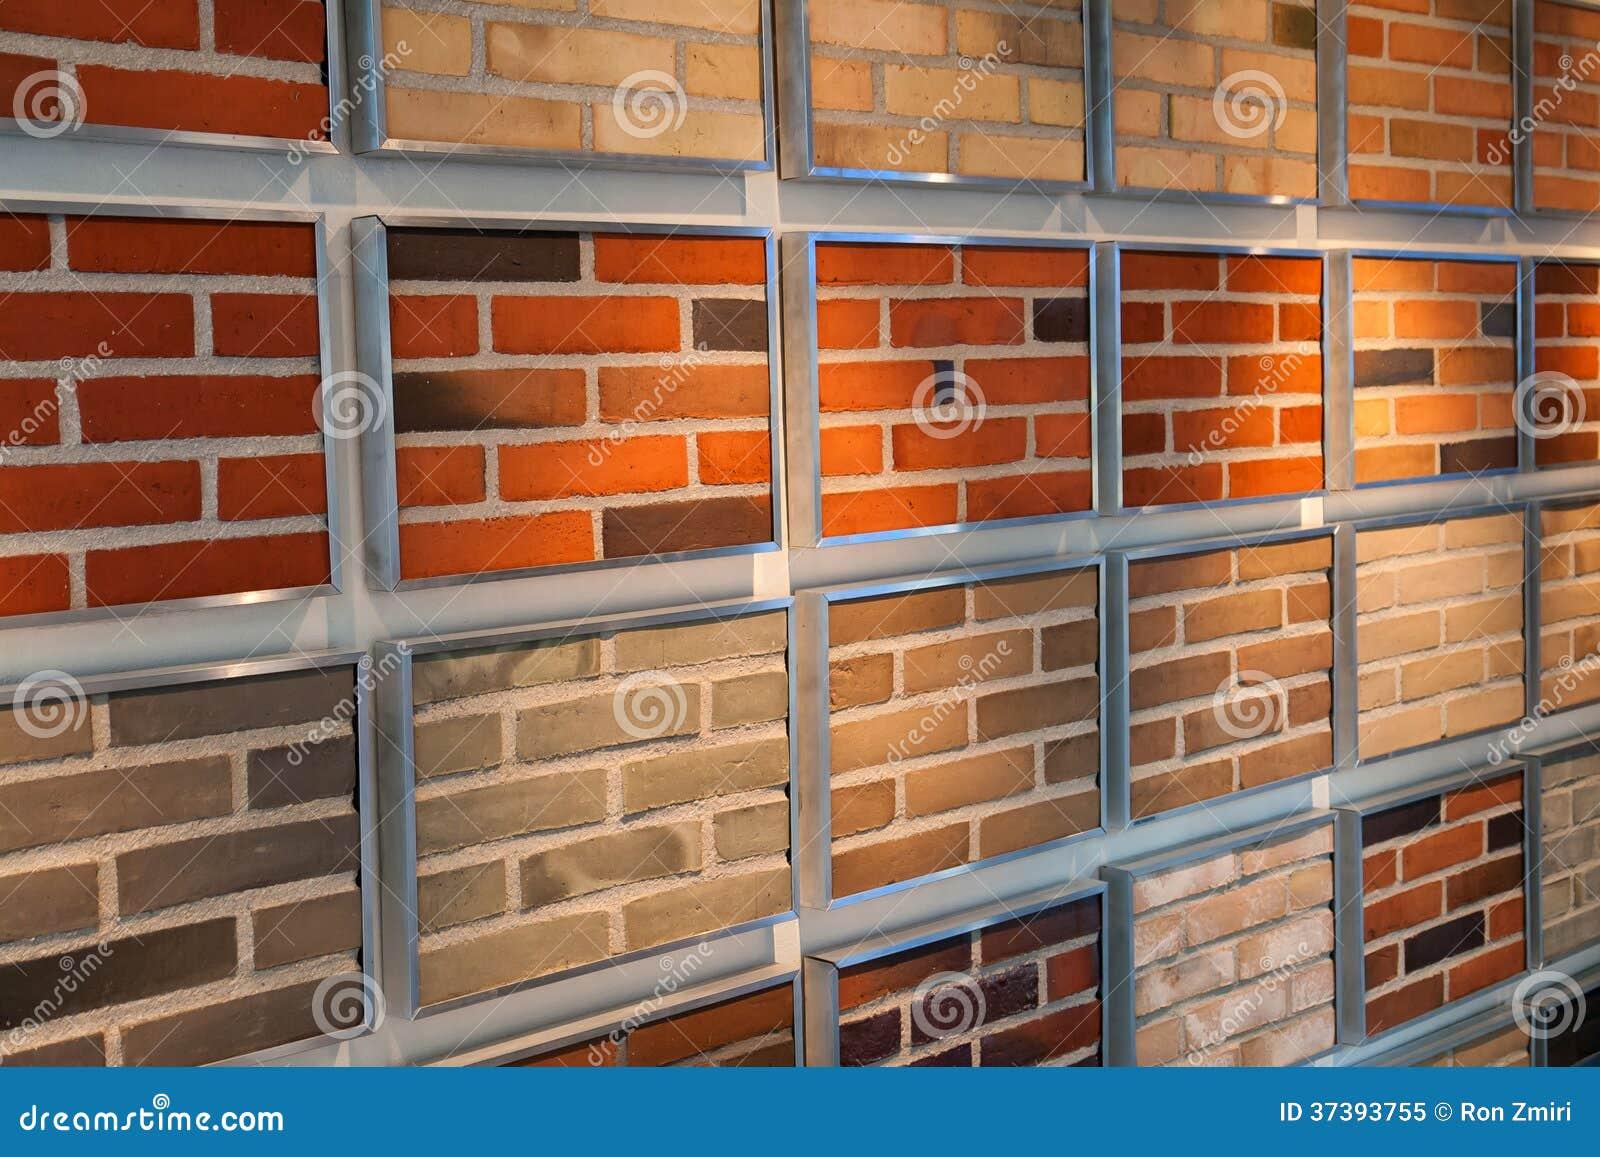 Decorative Bricks On Display Stock Image Image Of Solid